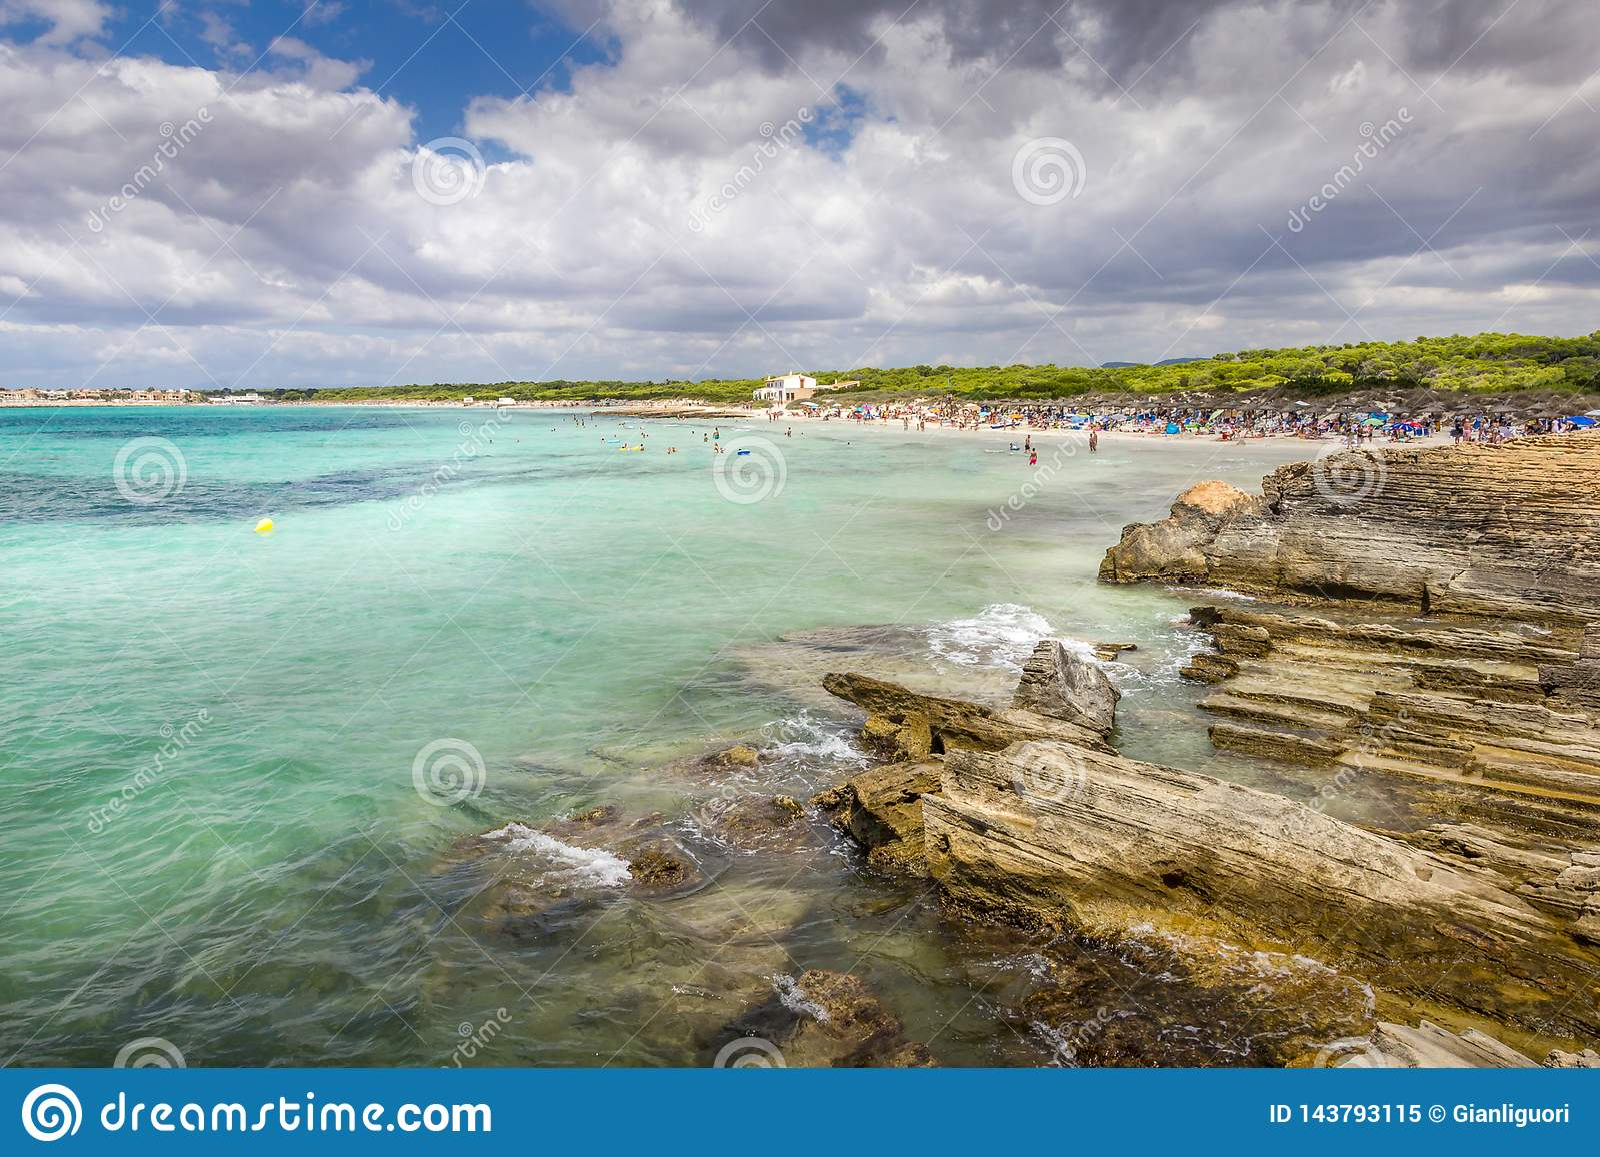 Paradisiac Beach, Es Trenc Majorca Spain Tourist